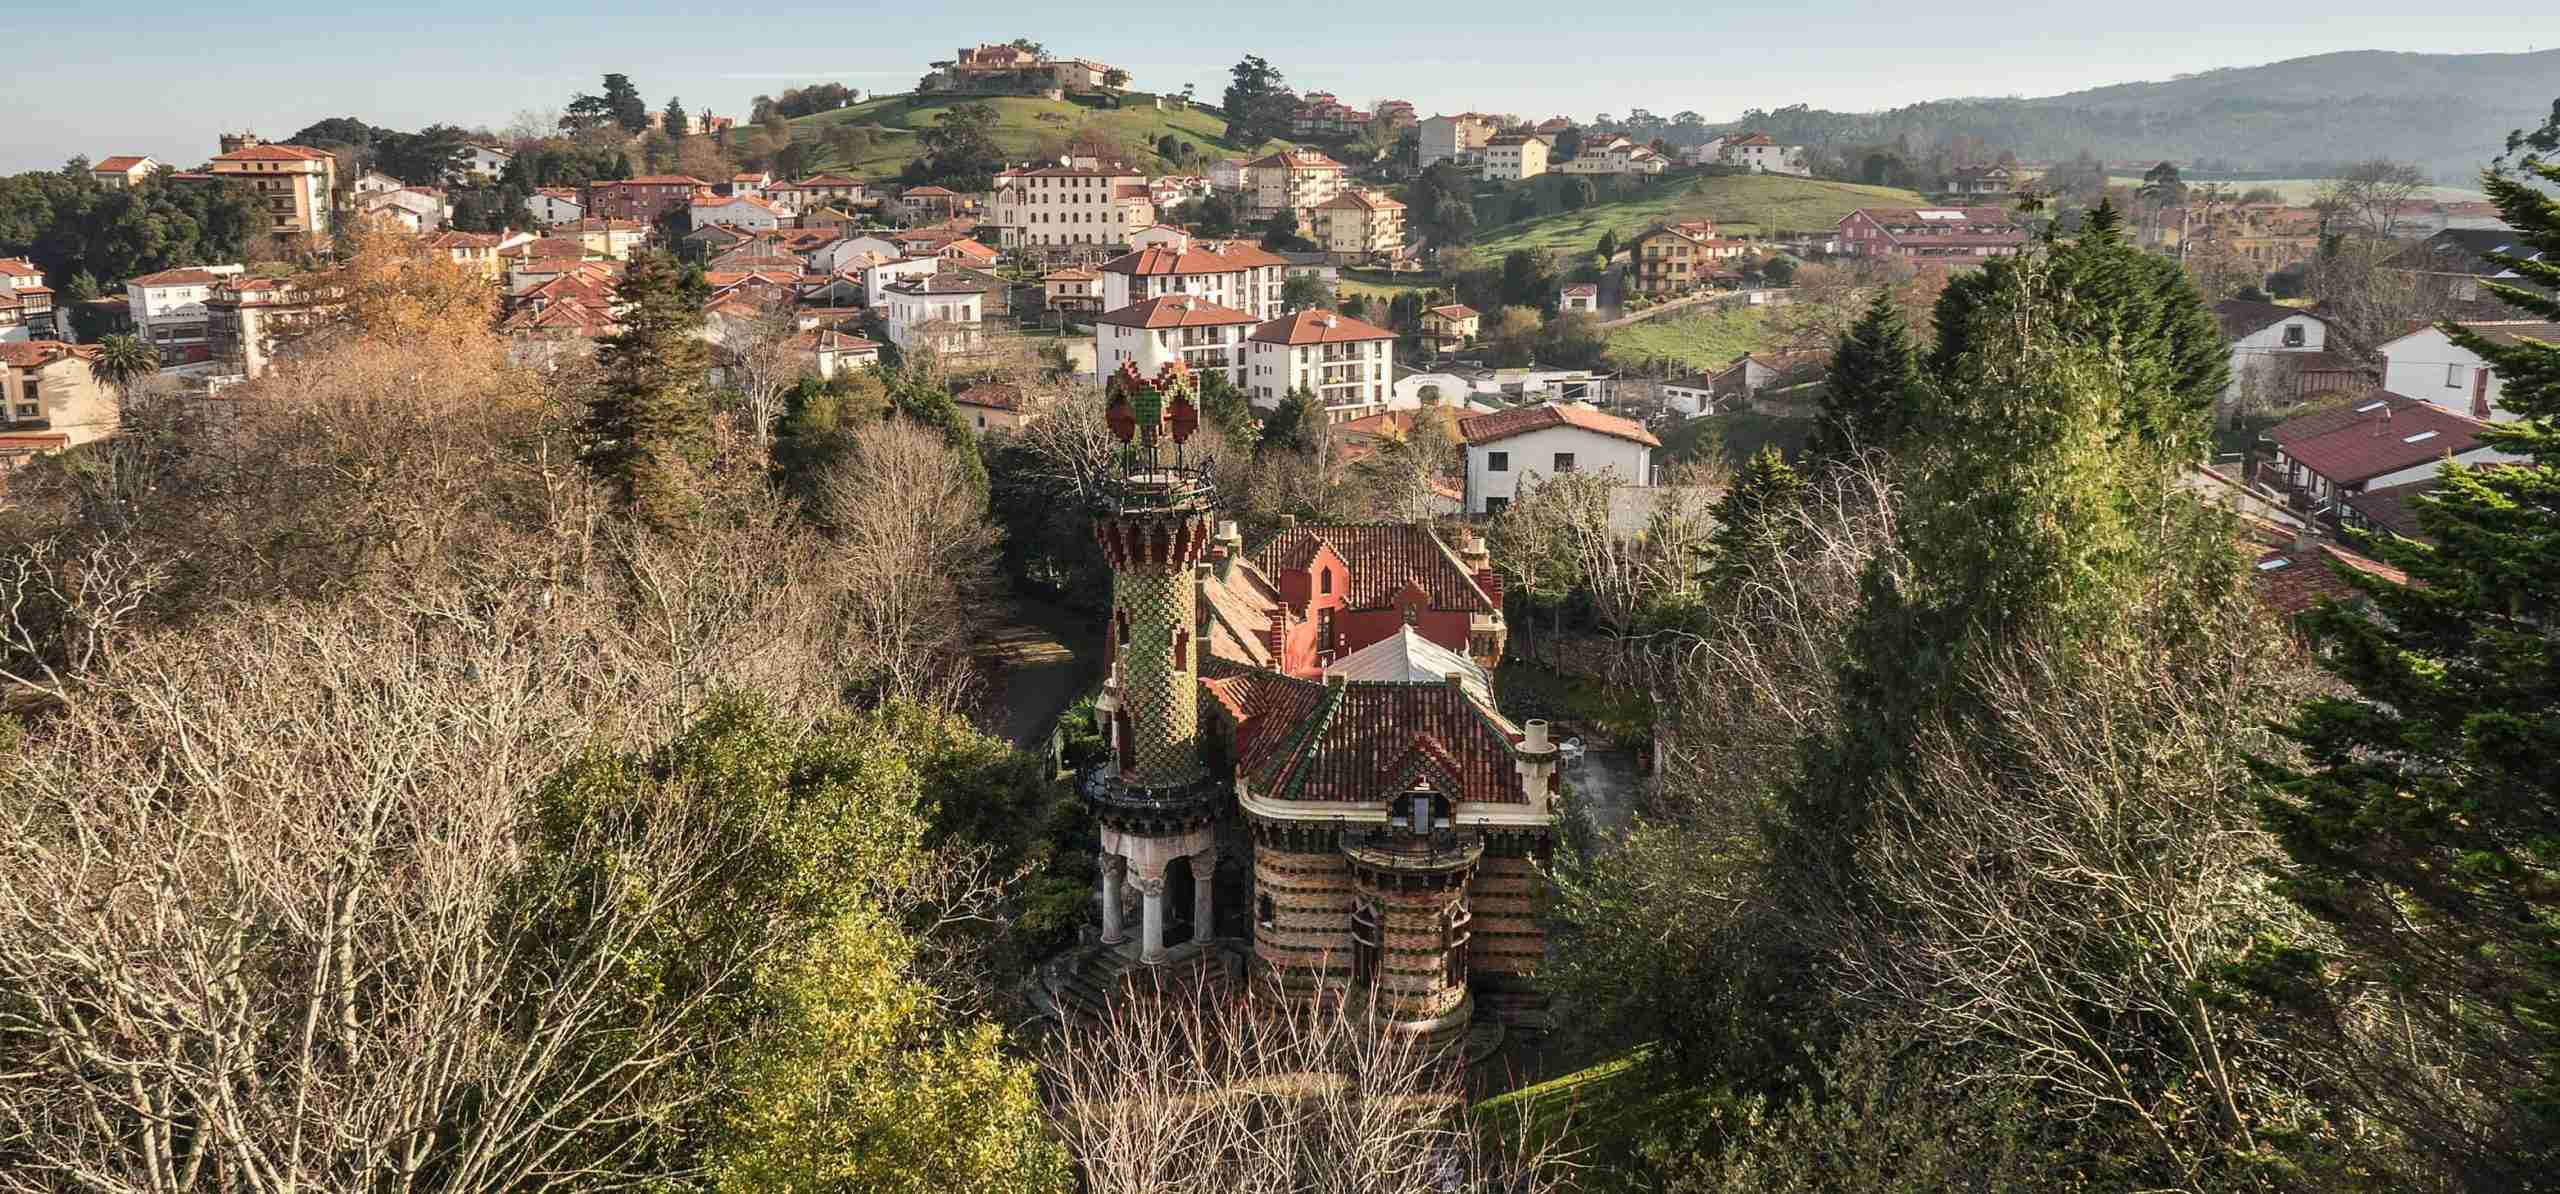 El capricho de gaudi turismo cantabria